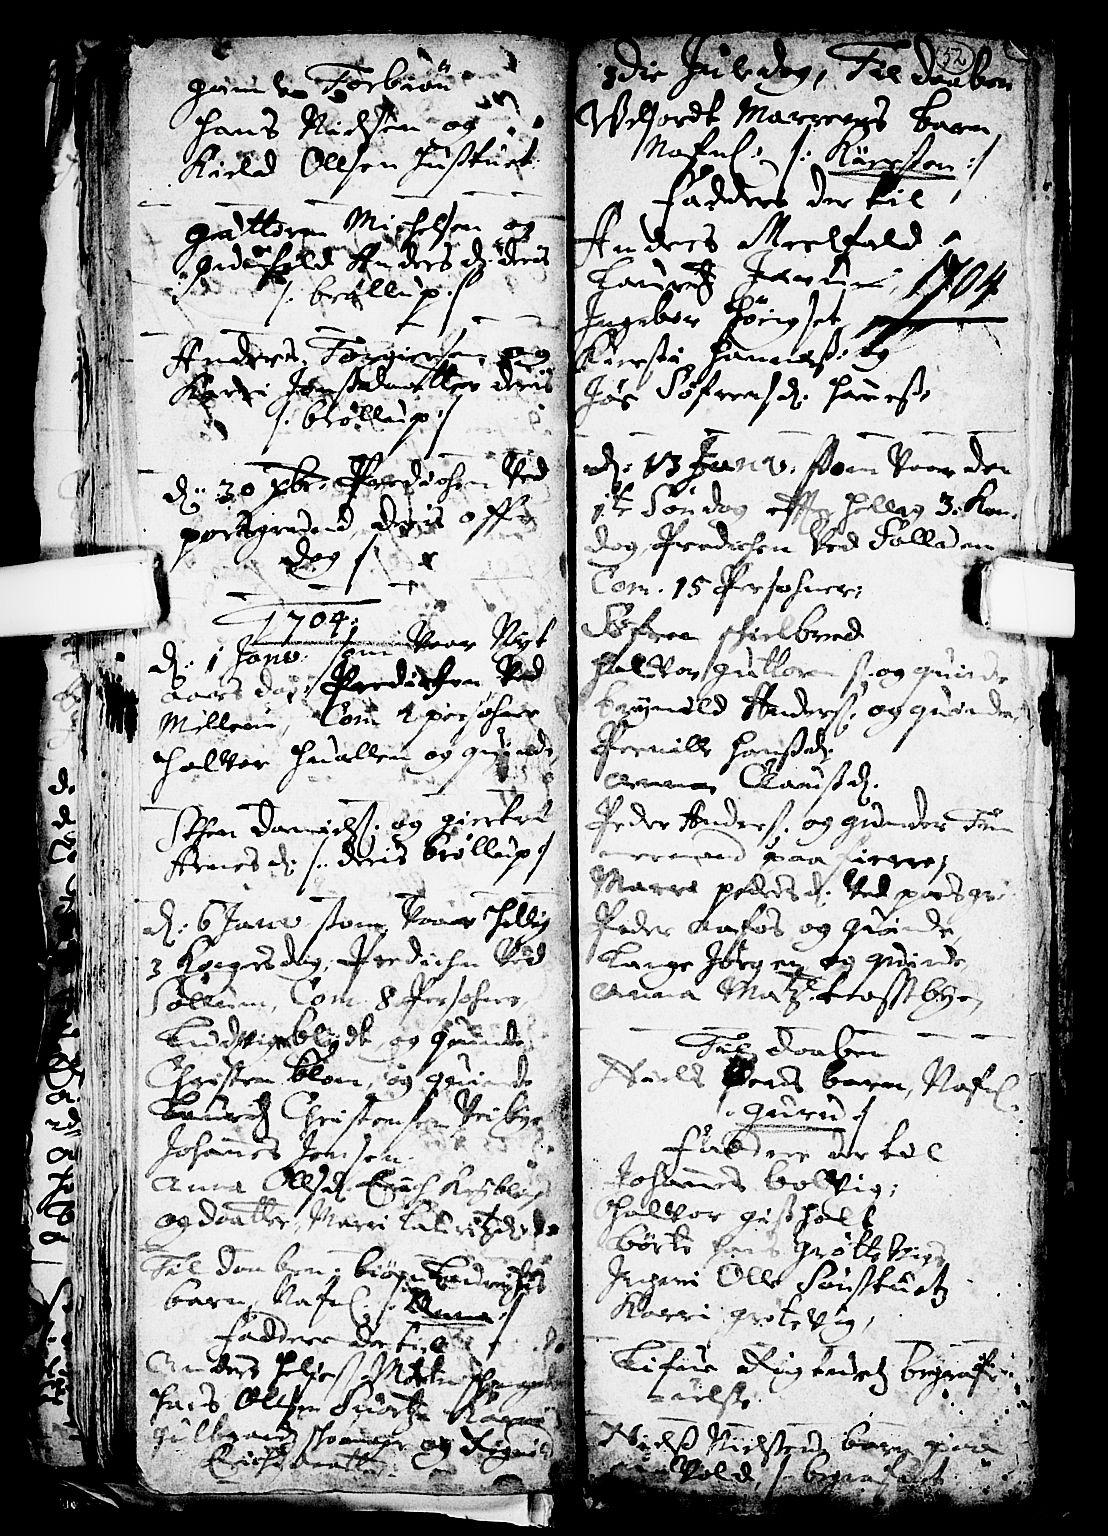 SAKO, Solum kirkebøker, F/Fa/L0001: Ministerialbok nr. I 1, 1701-1716, s. 52